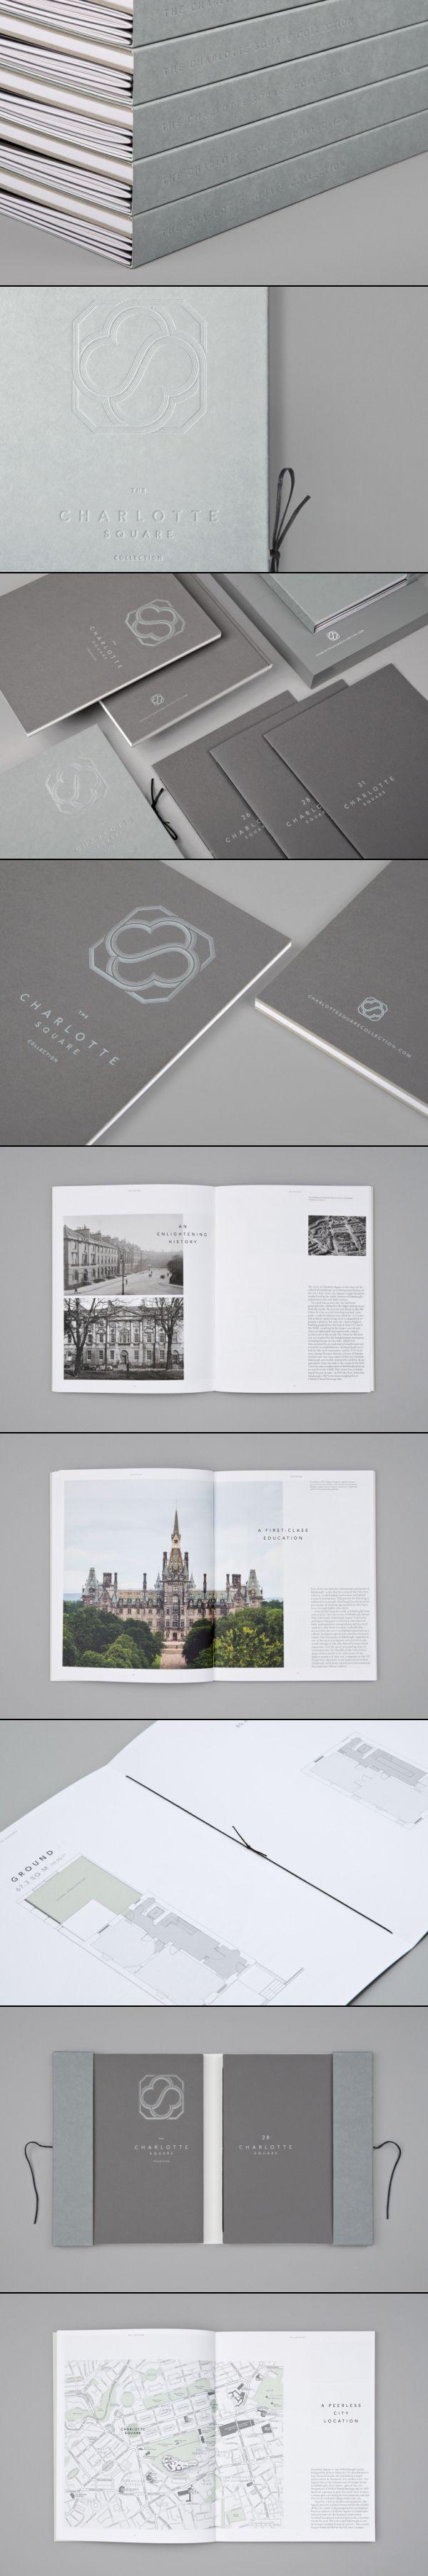 Station House BookletsLeaflets Including Rental prices Photos